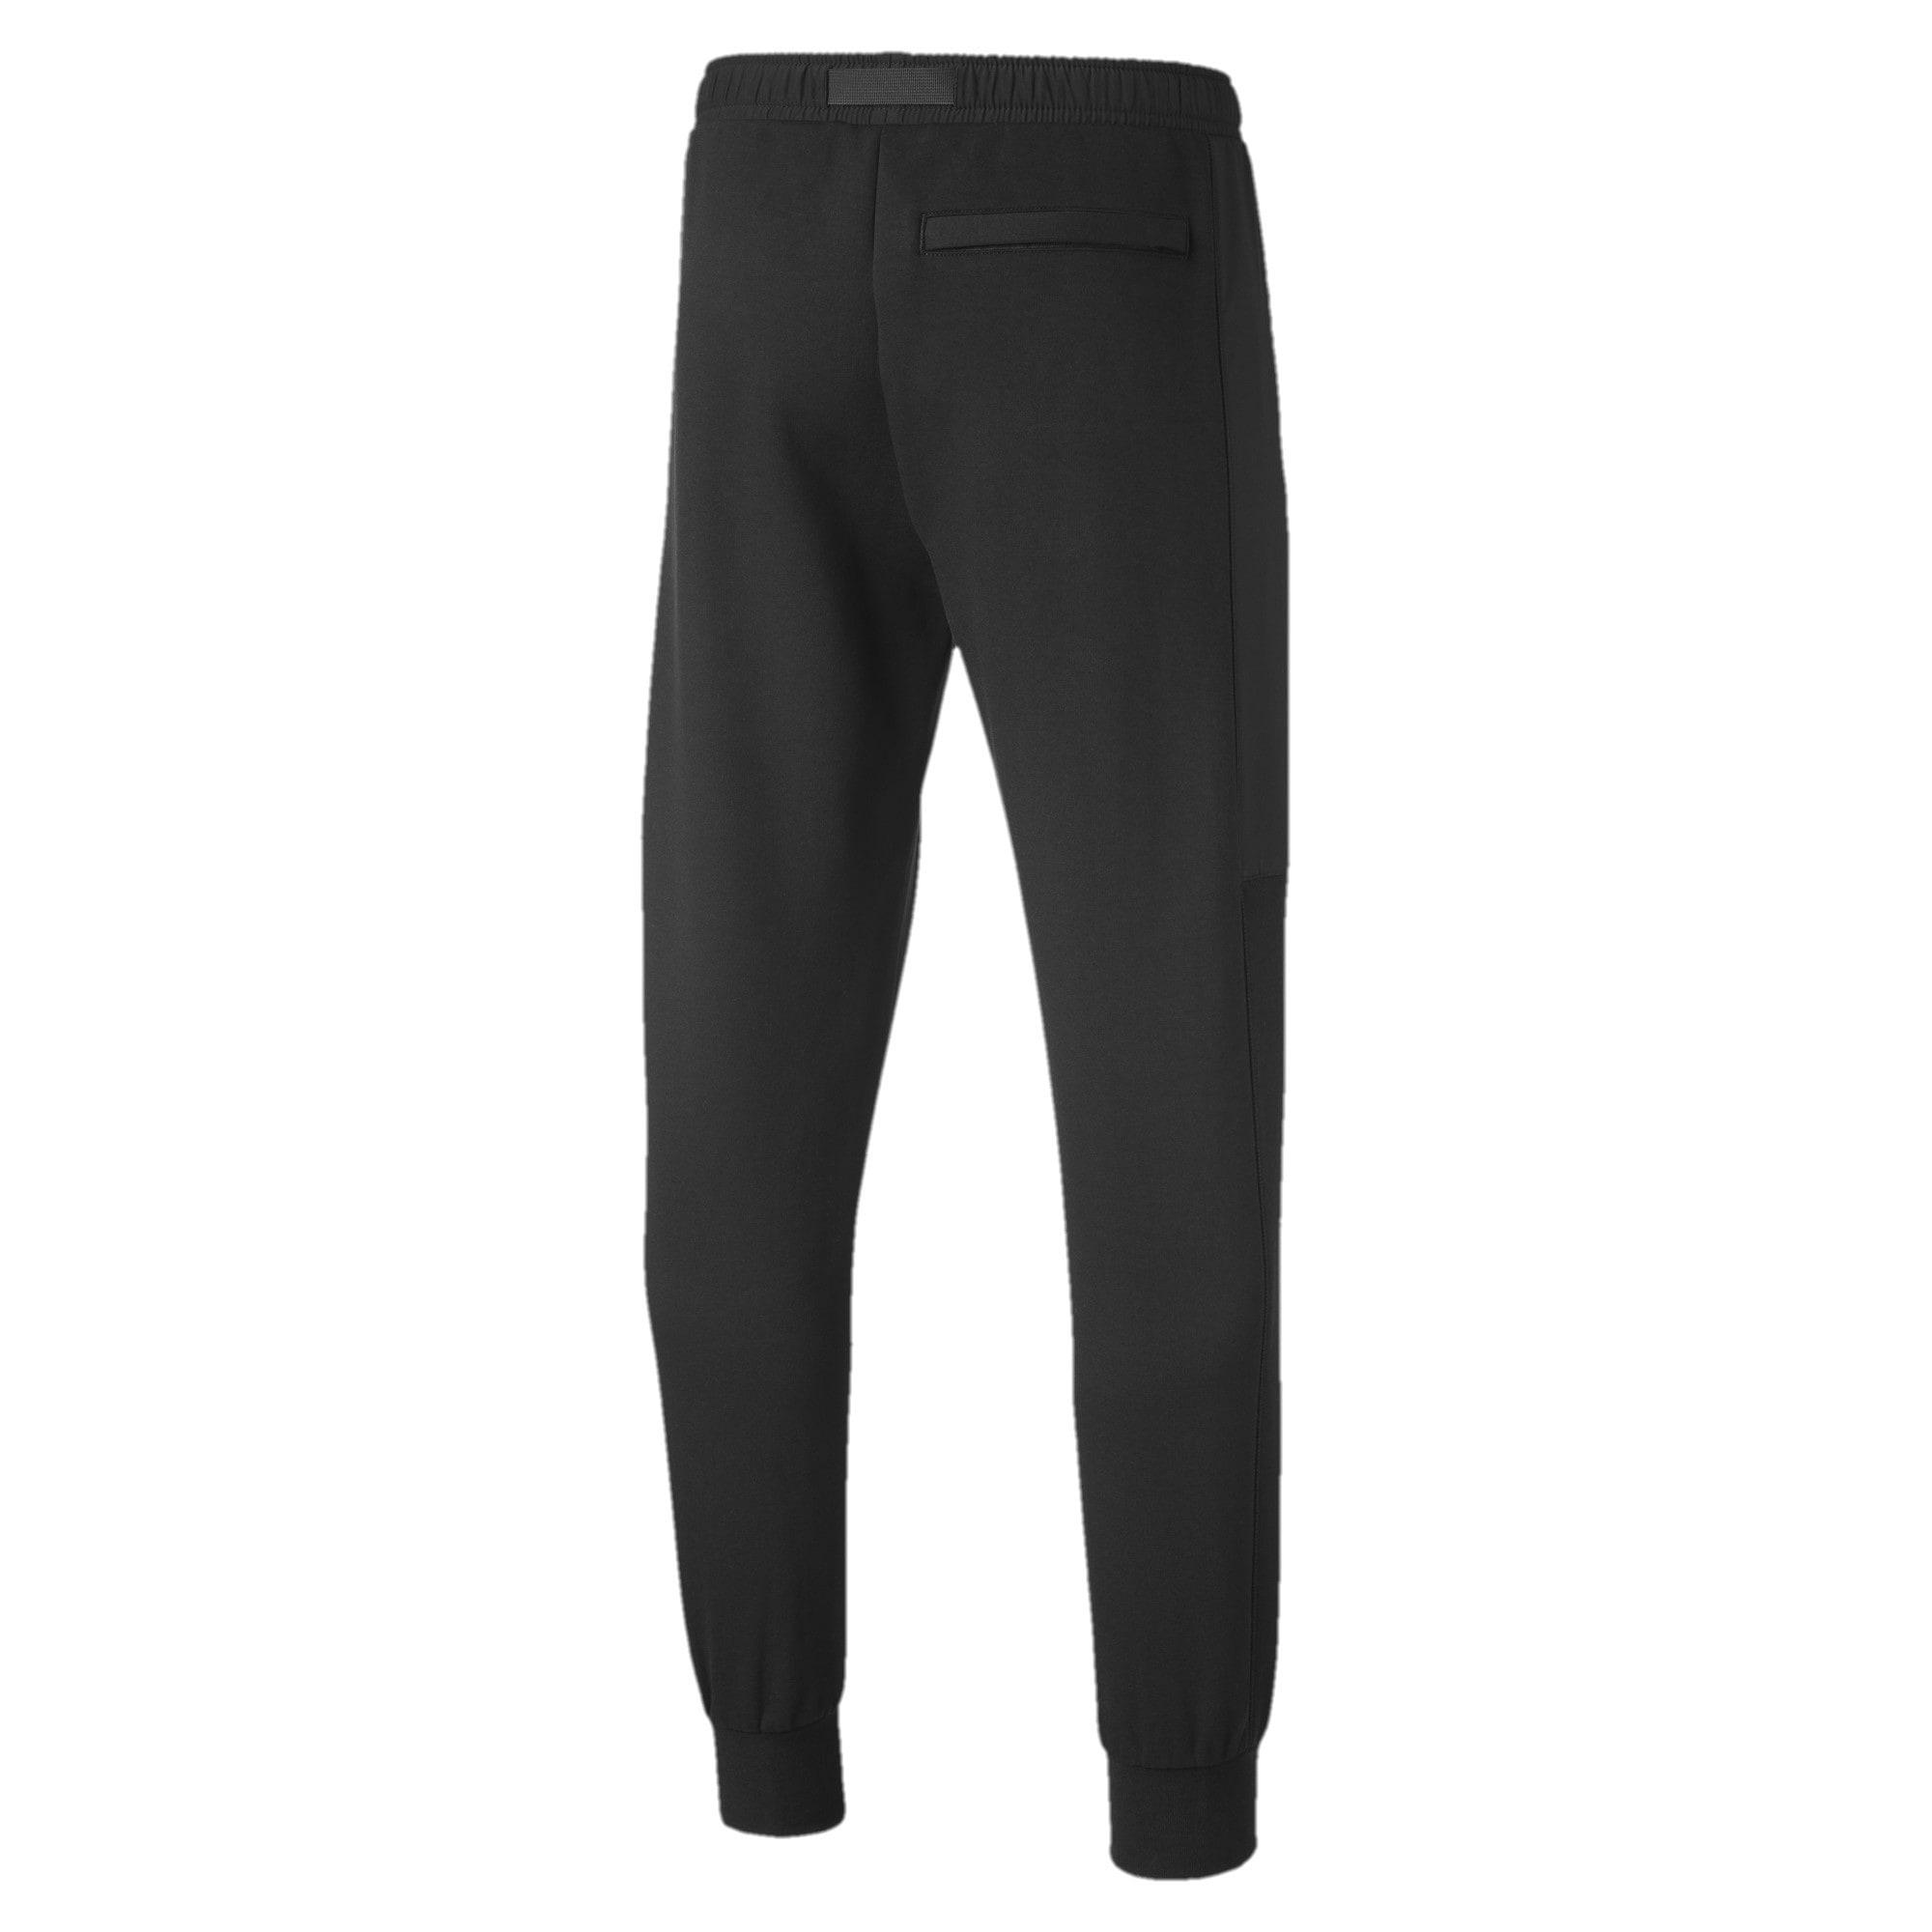 Miniatura 5 de Pantalones deportivos Epoch Hybrid para hombre, Puma Black, mediano